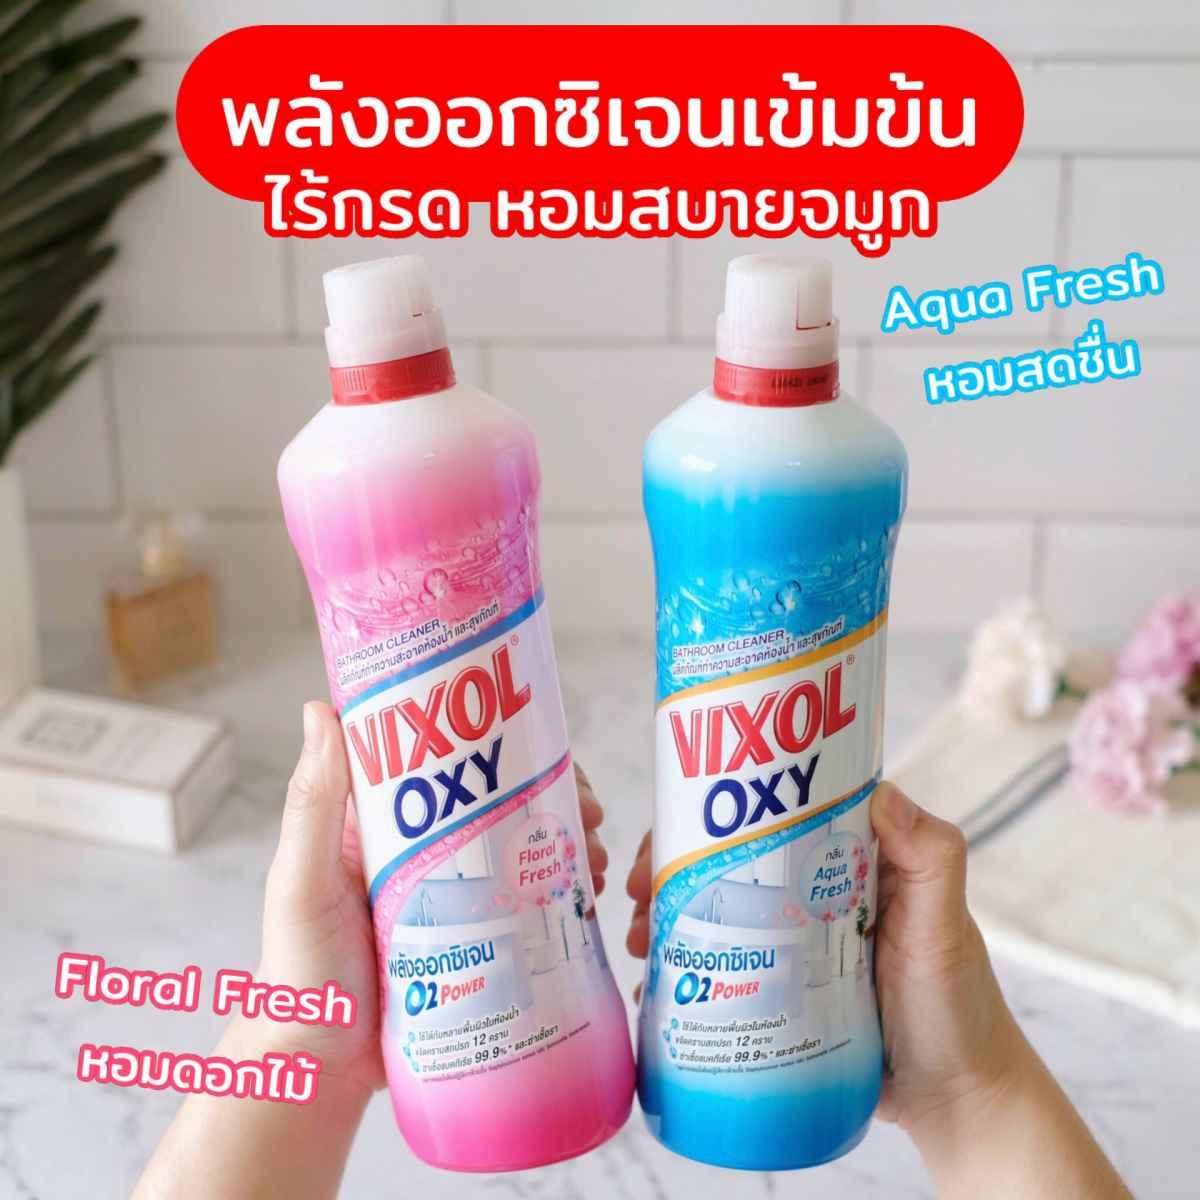 Vixol Oxy